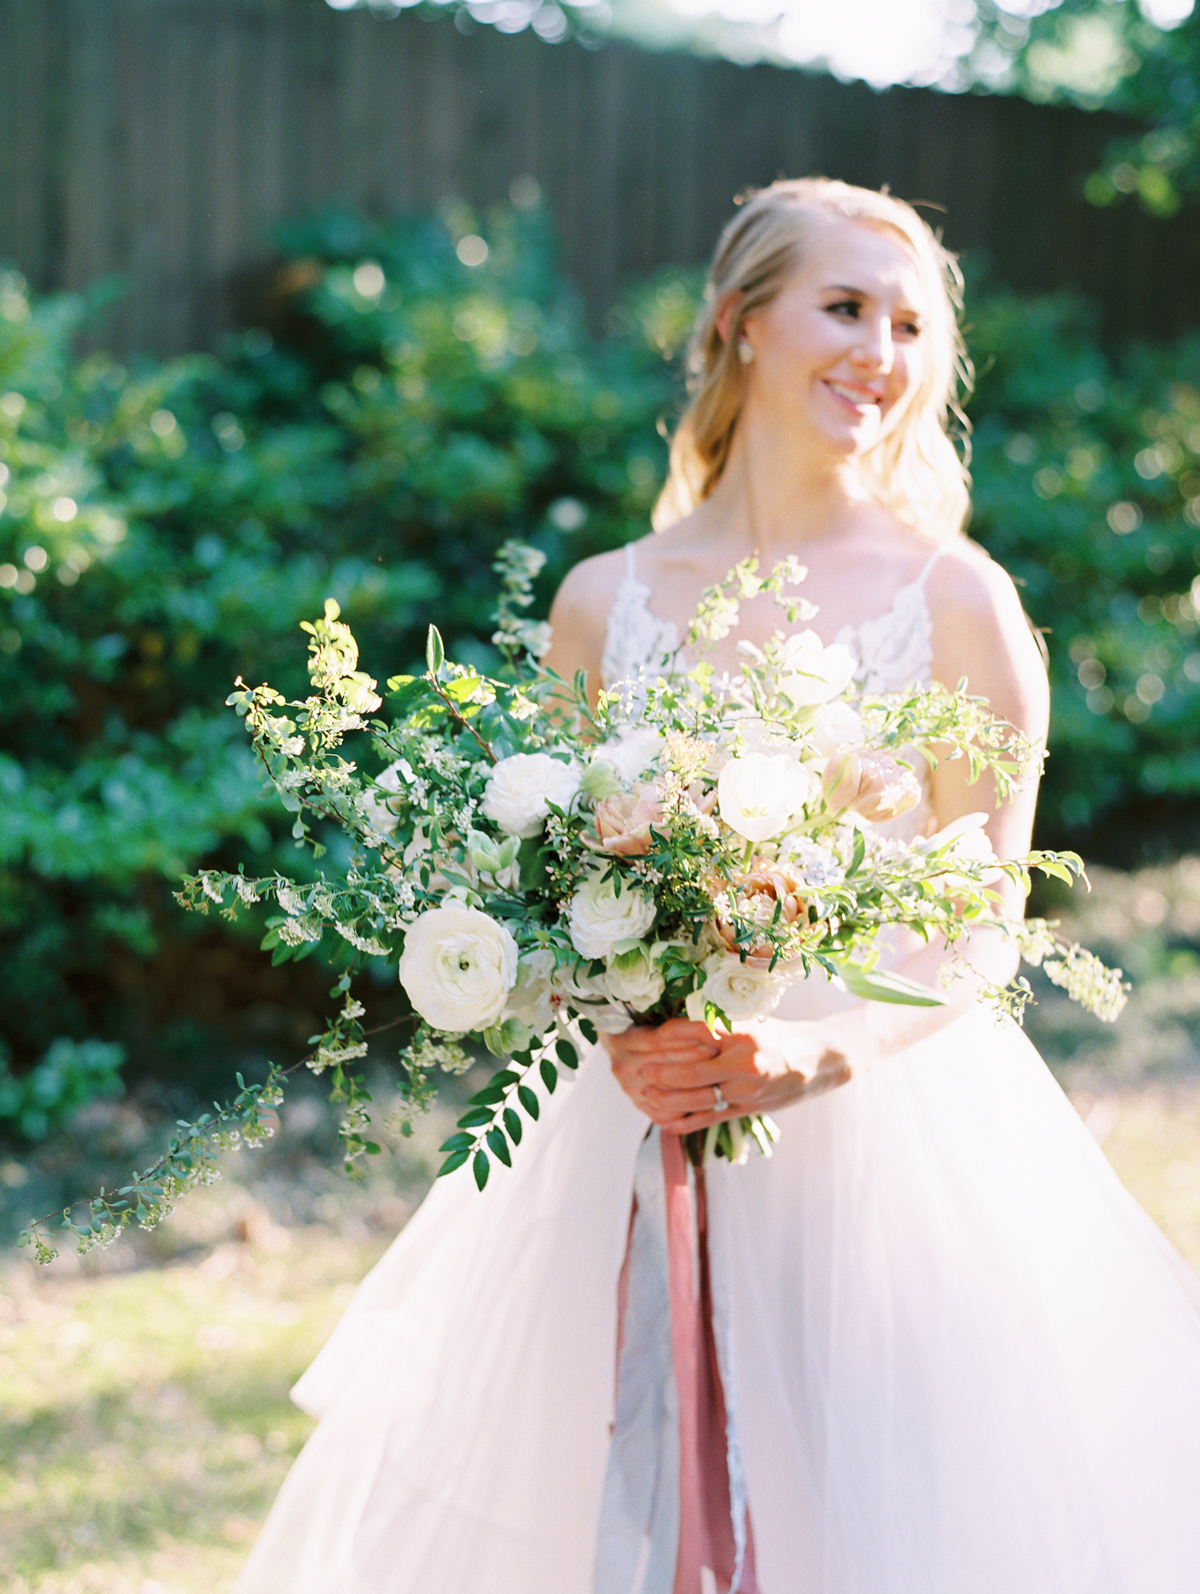 Foundry-At-Puritan-Mill-wedding-photos-venue-atlanta-fine-art-film-photographer48.JPG